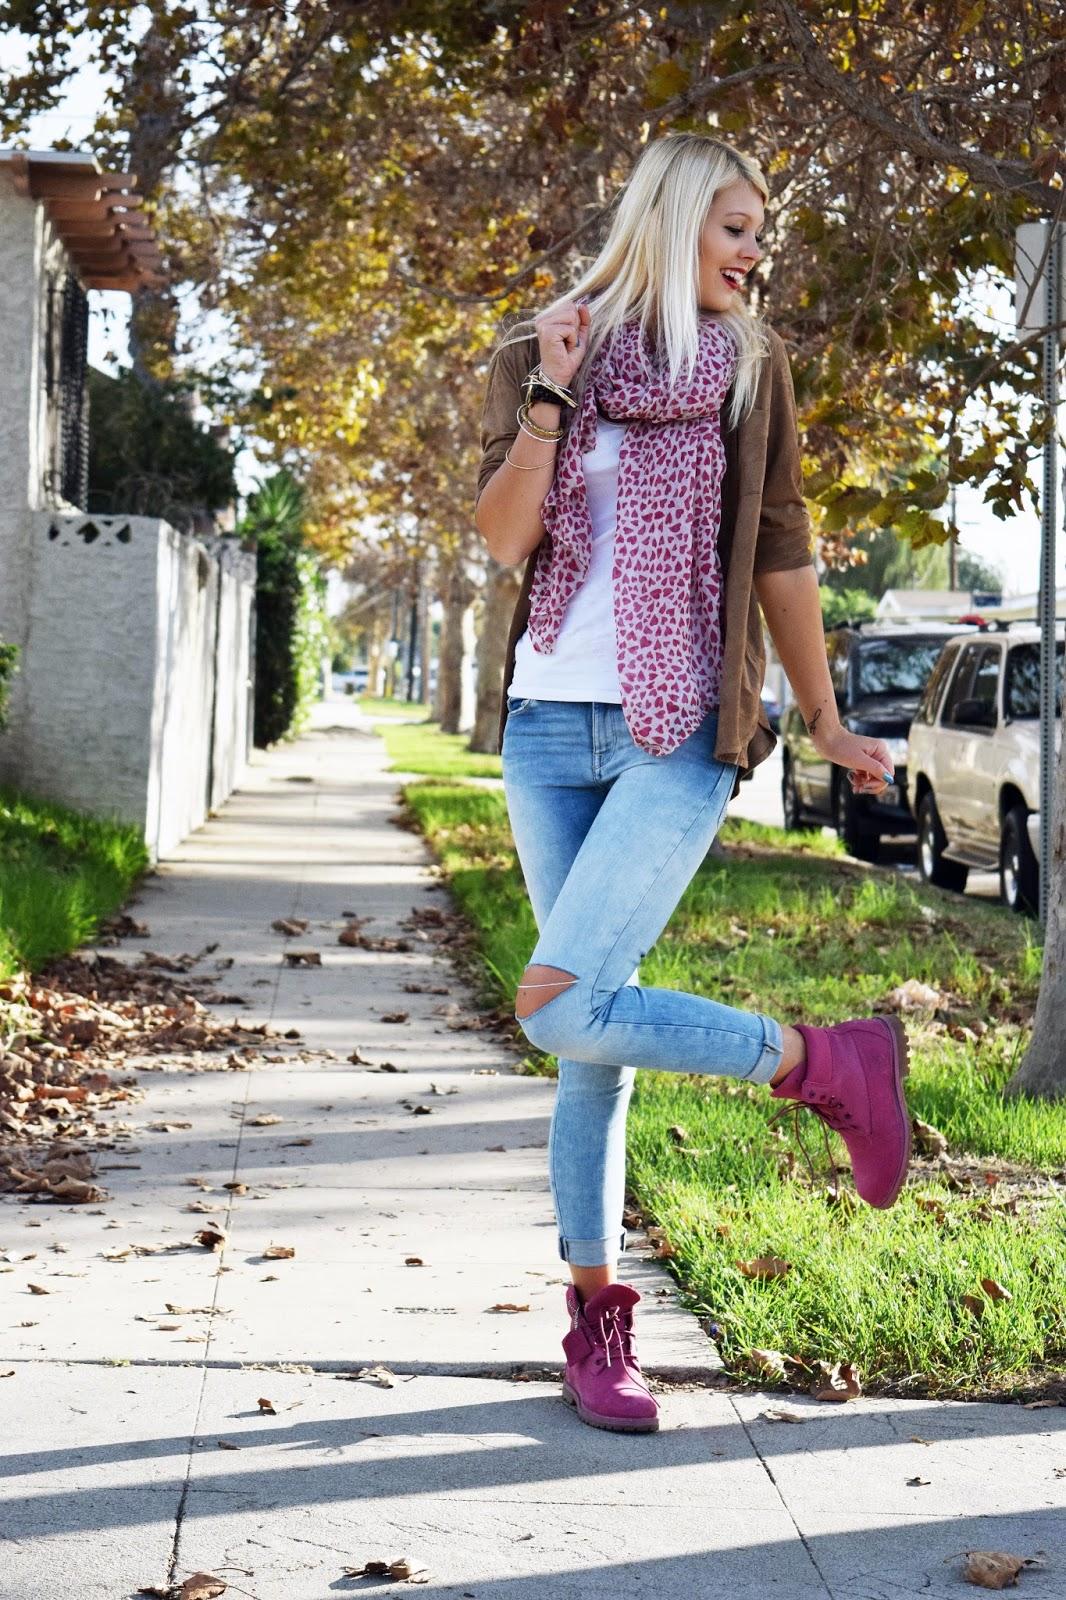 Suede shirt, boyfriend shirt, Timberland boots, Fall, Scarf, Heart scarf